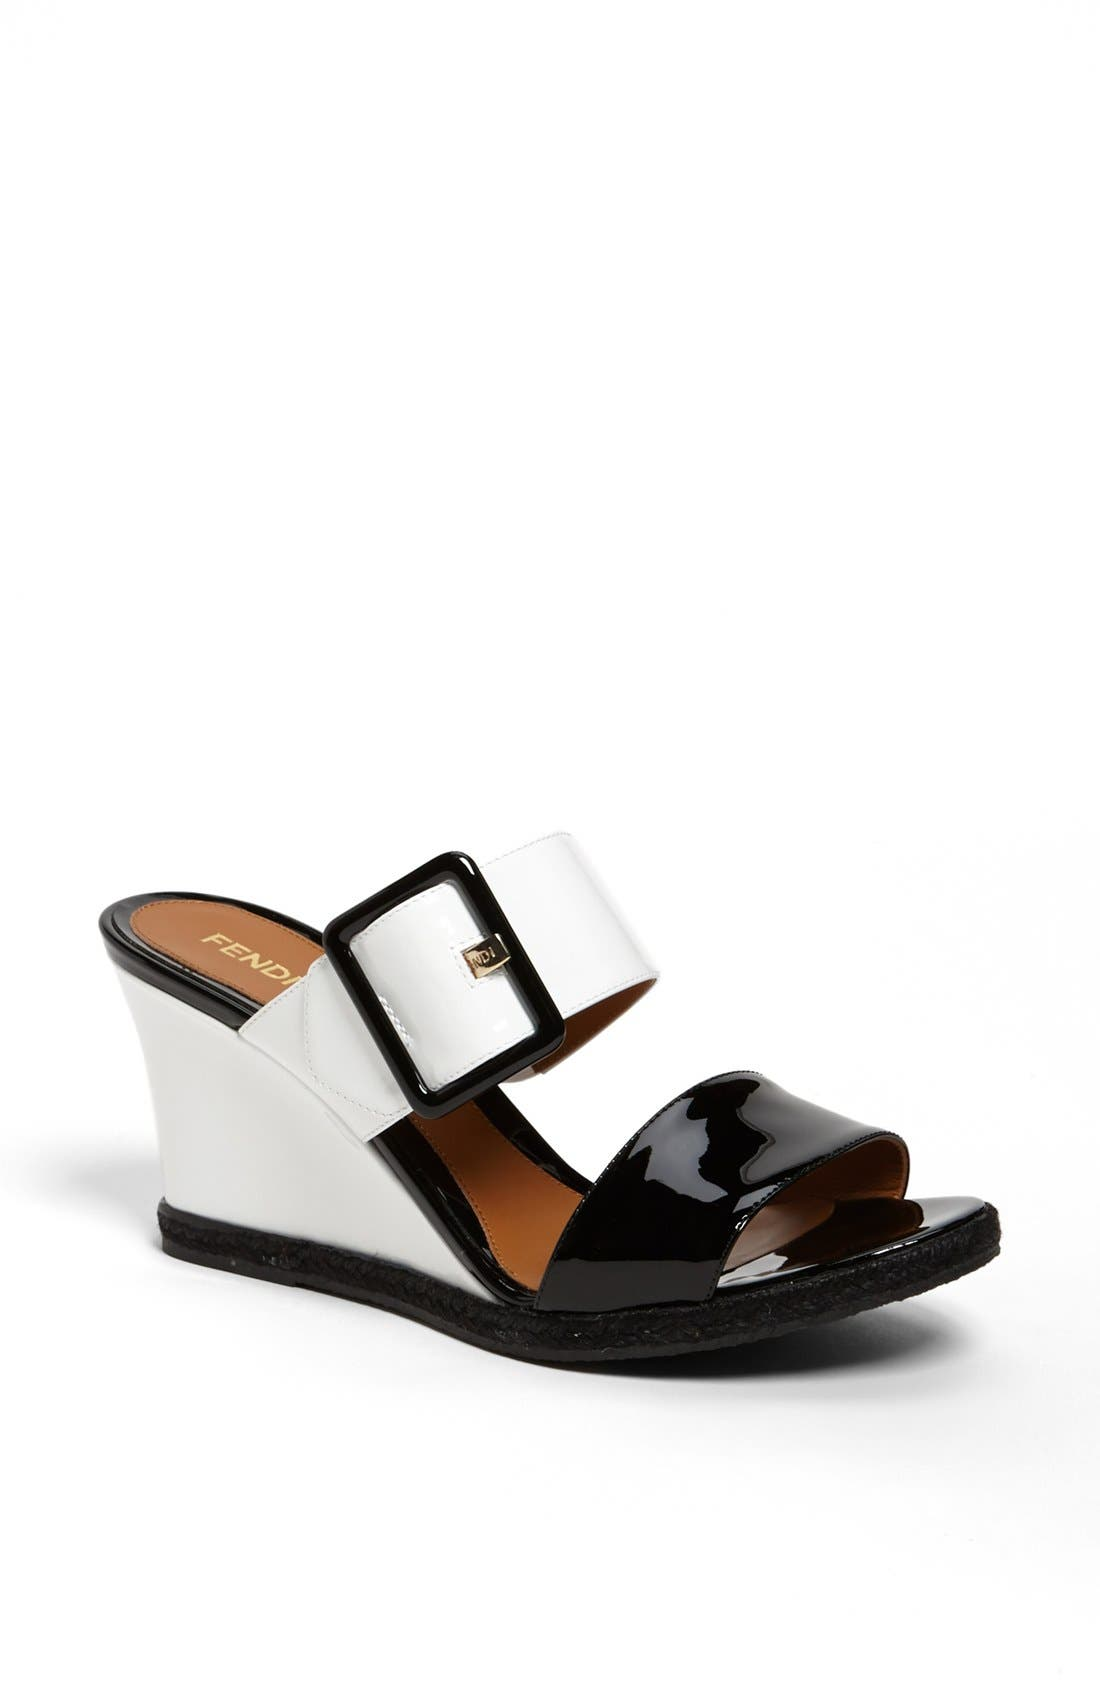 Alternate Image 1 Selected - Fendi 'Vernis' Wedge Sandal